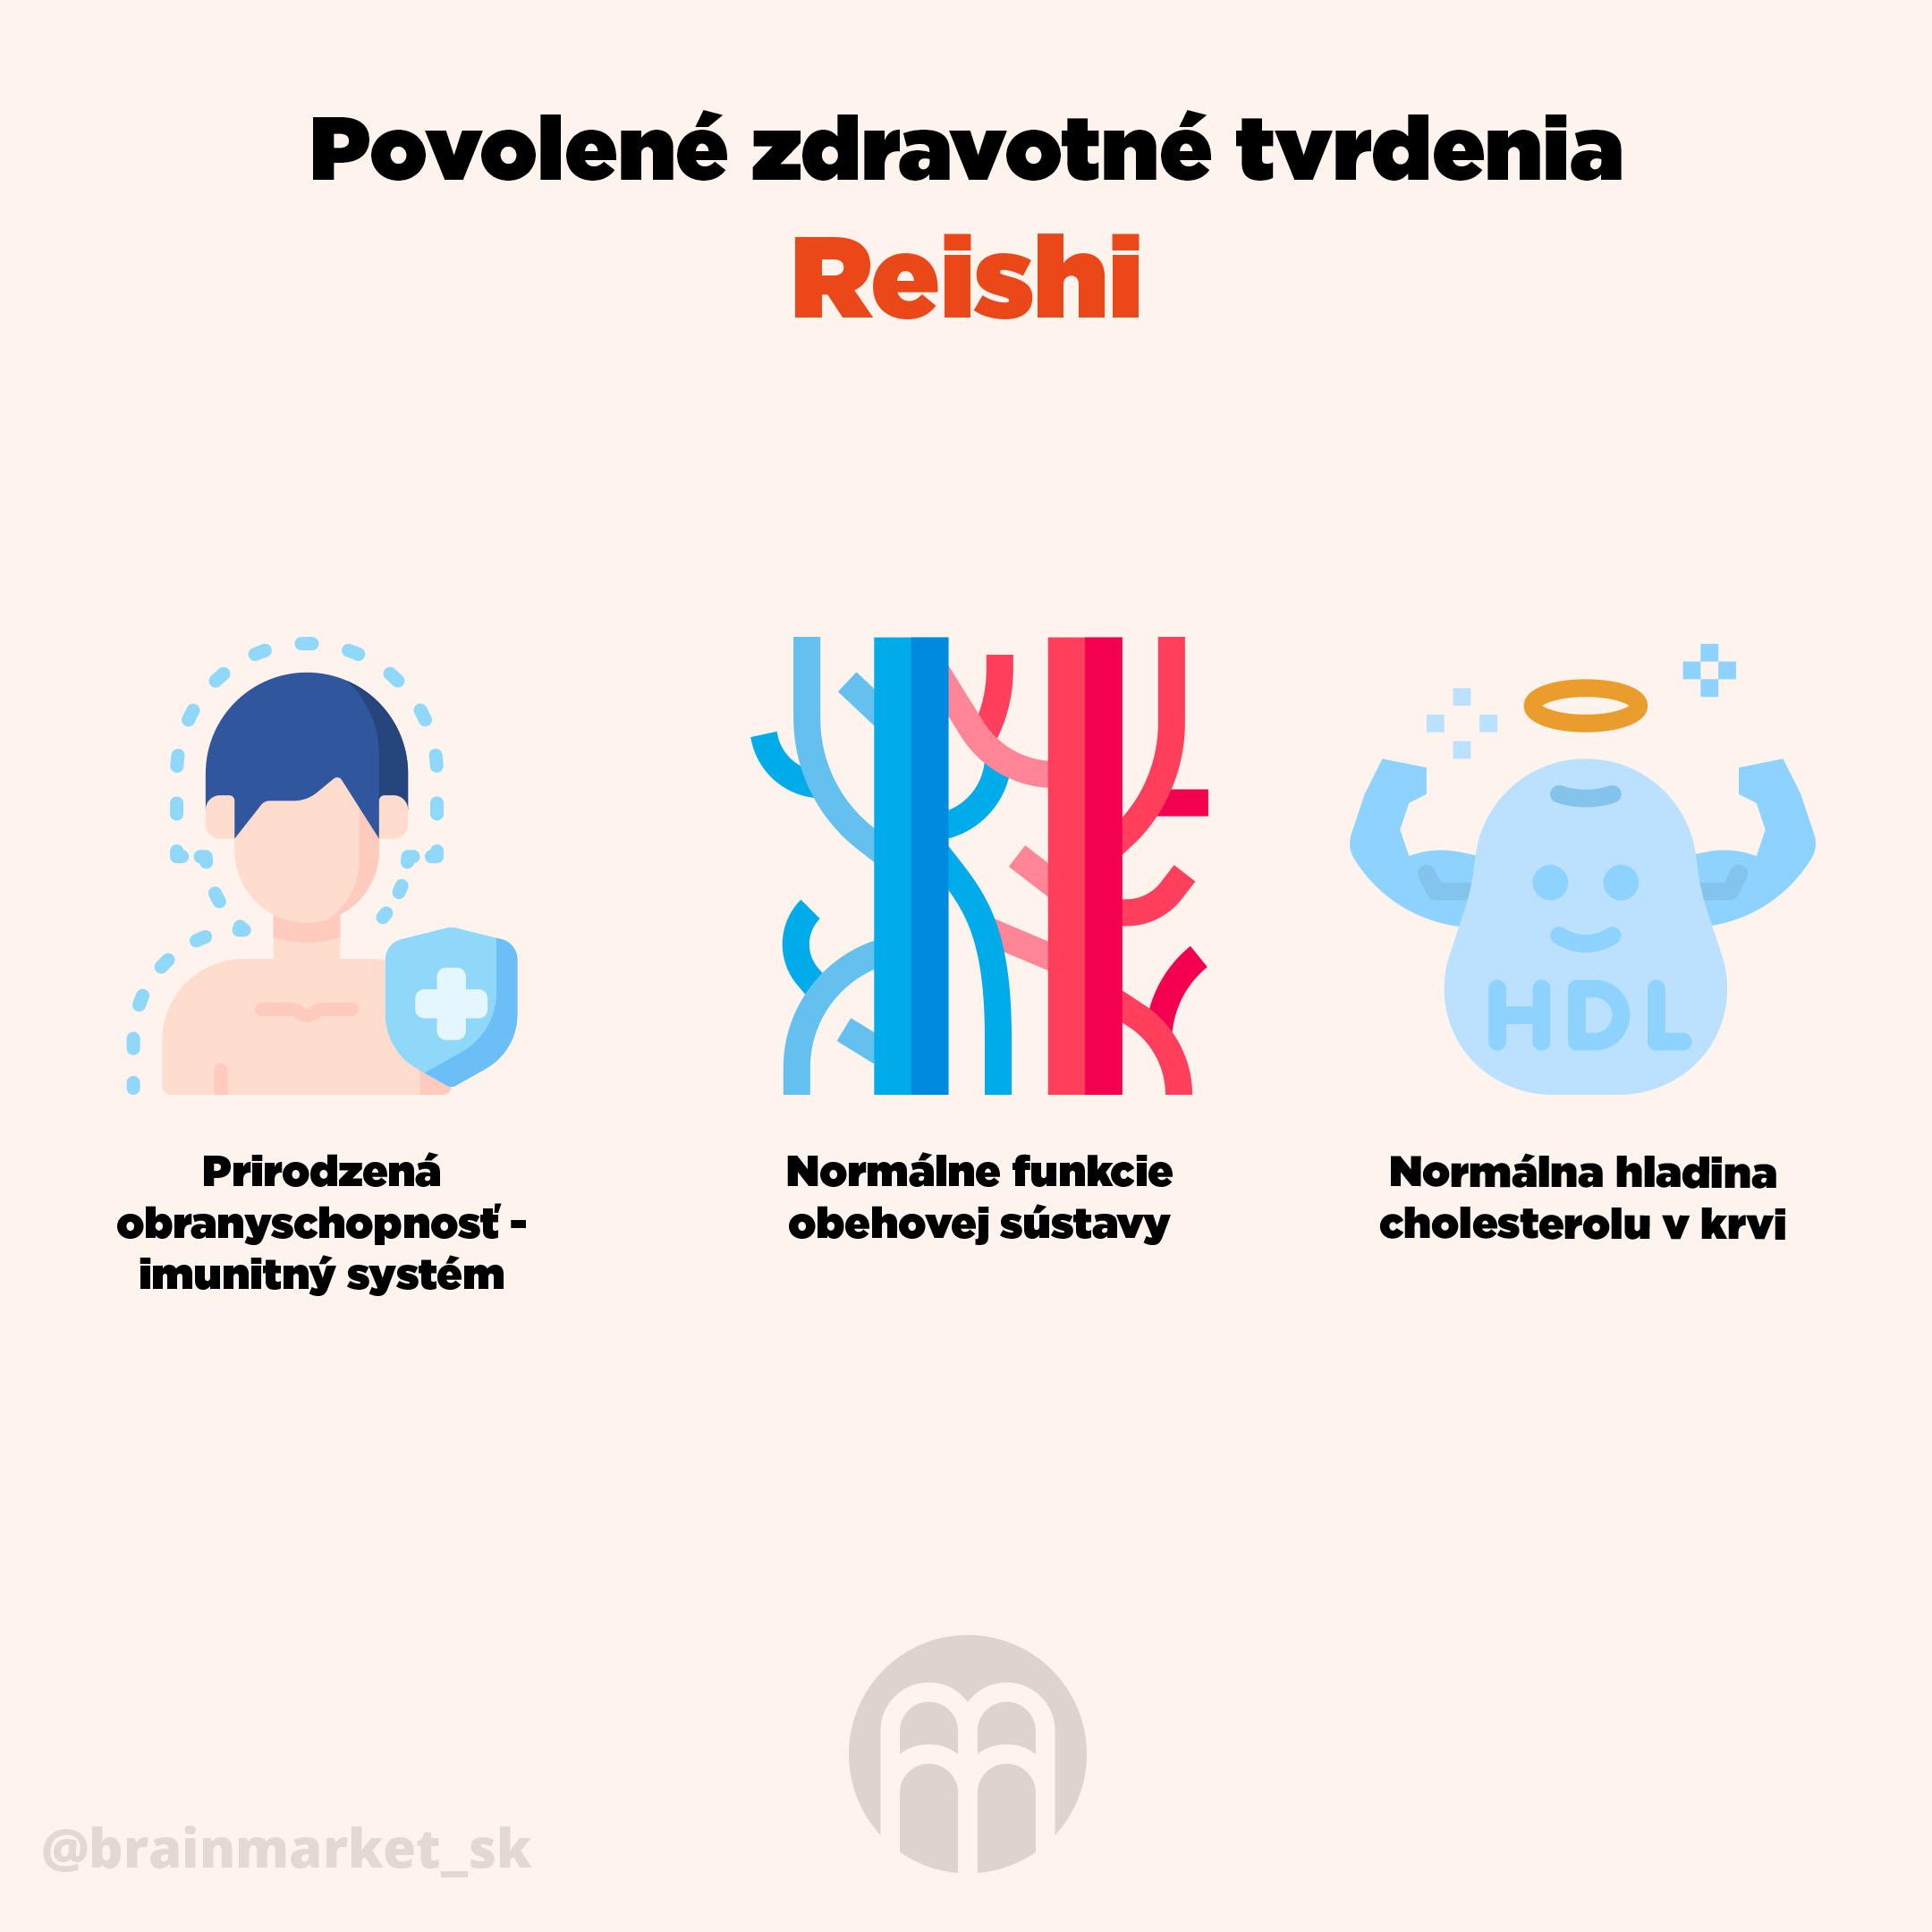 schvalena_zdrav_reishi_infografika_brainmarket_sk